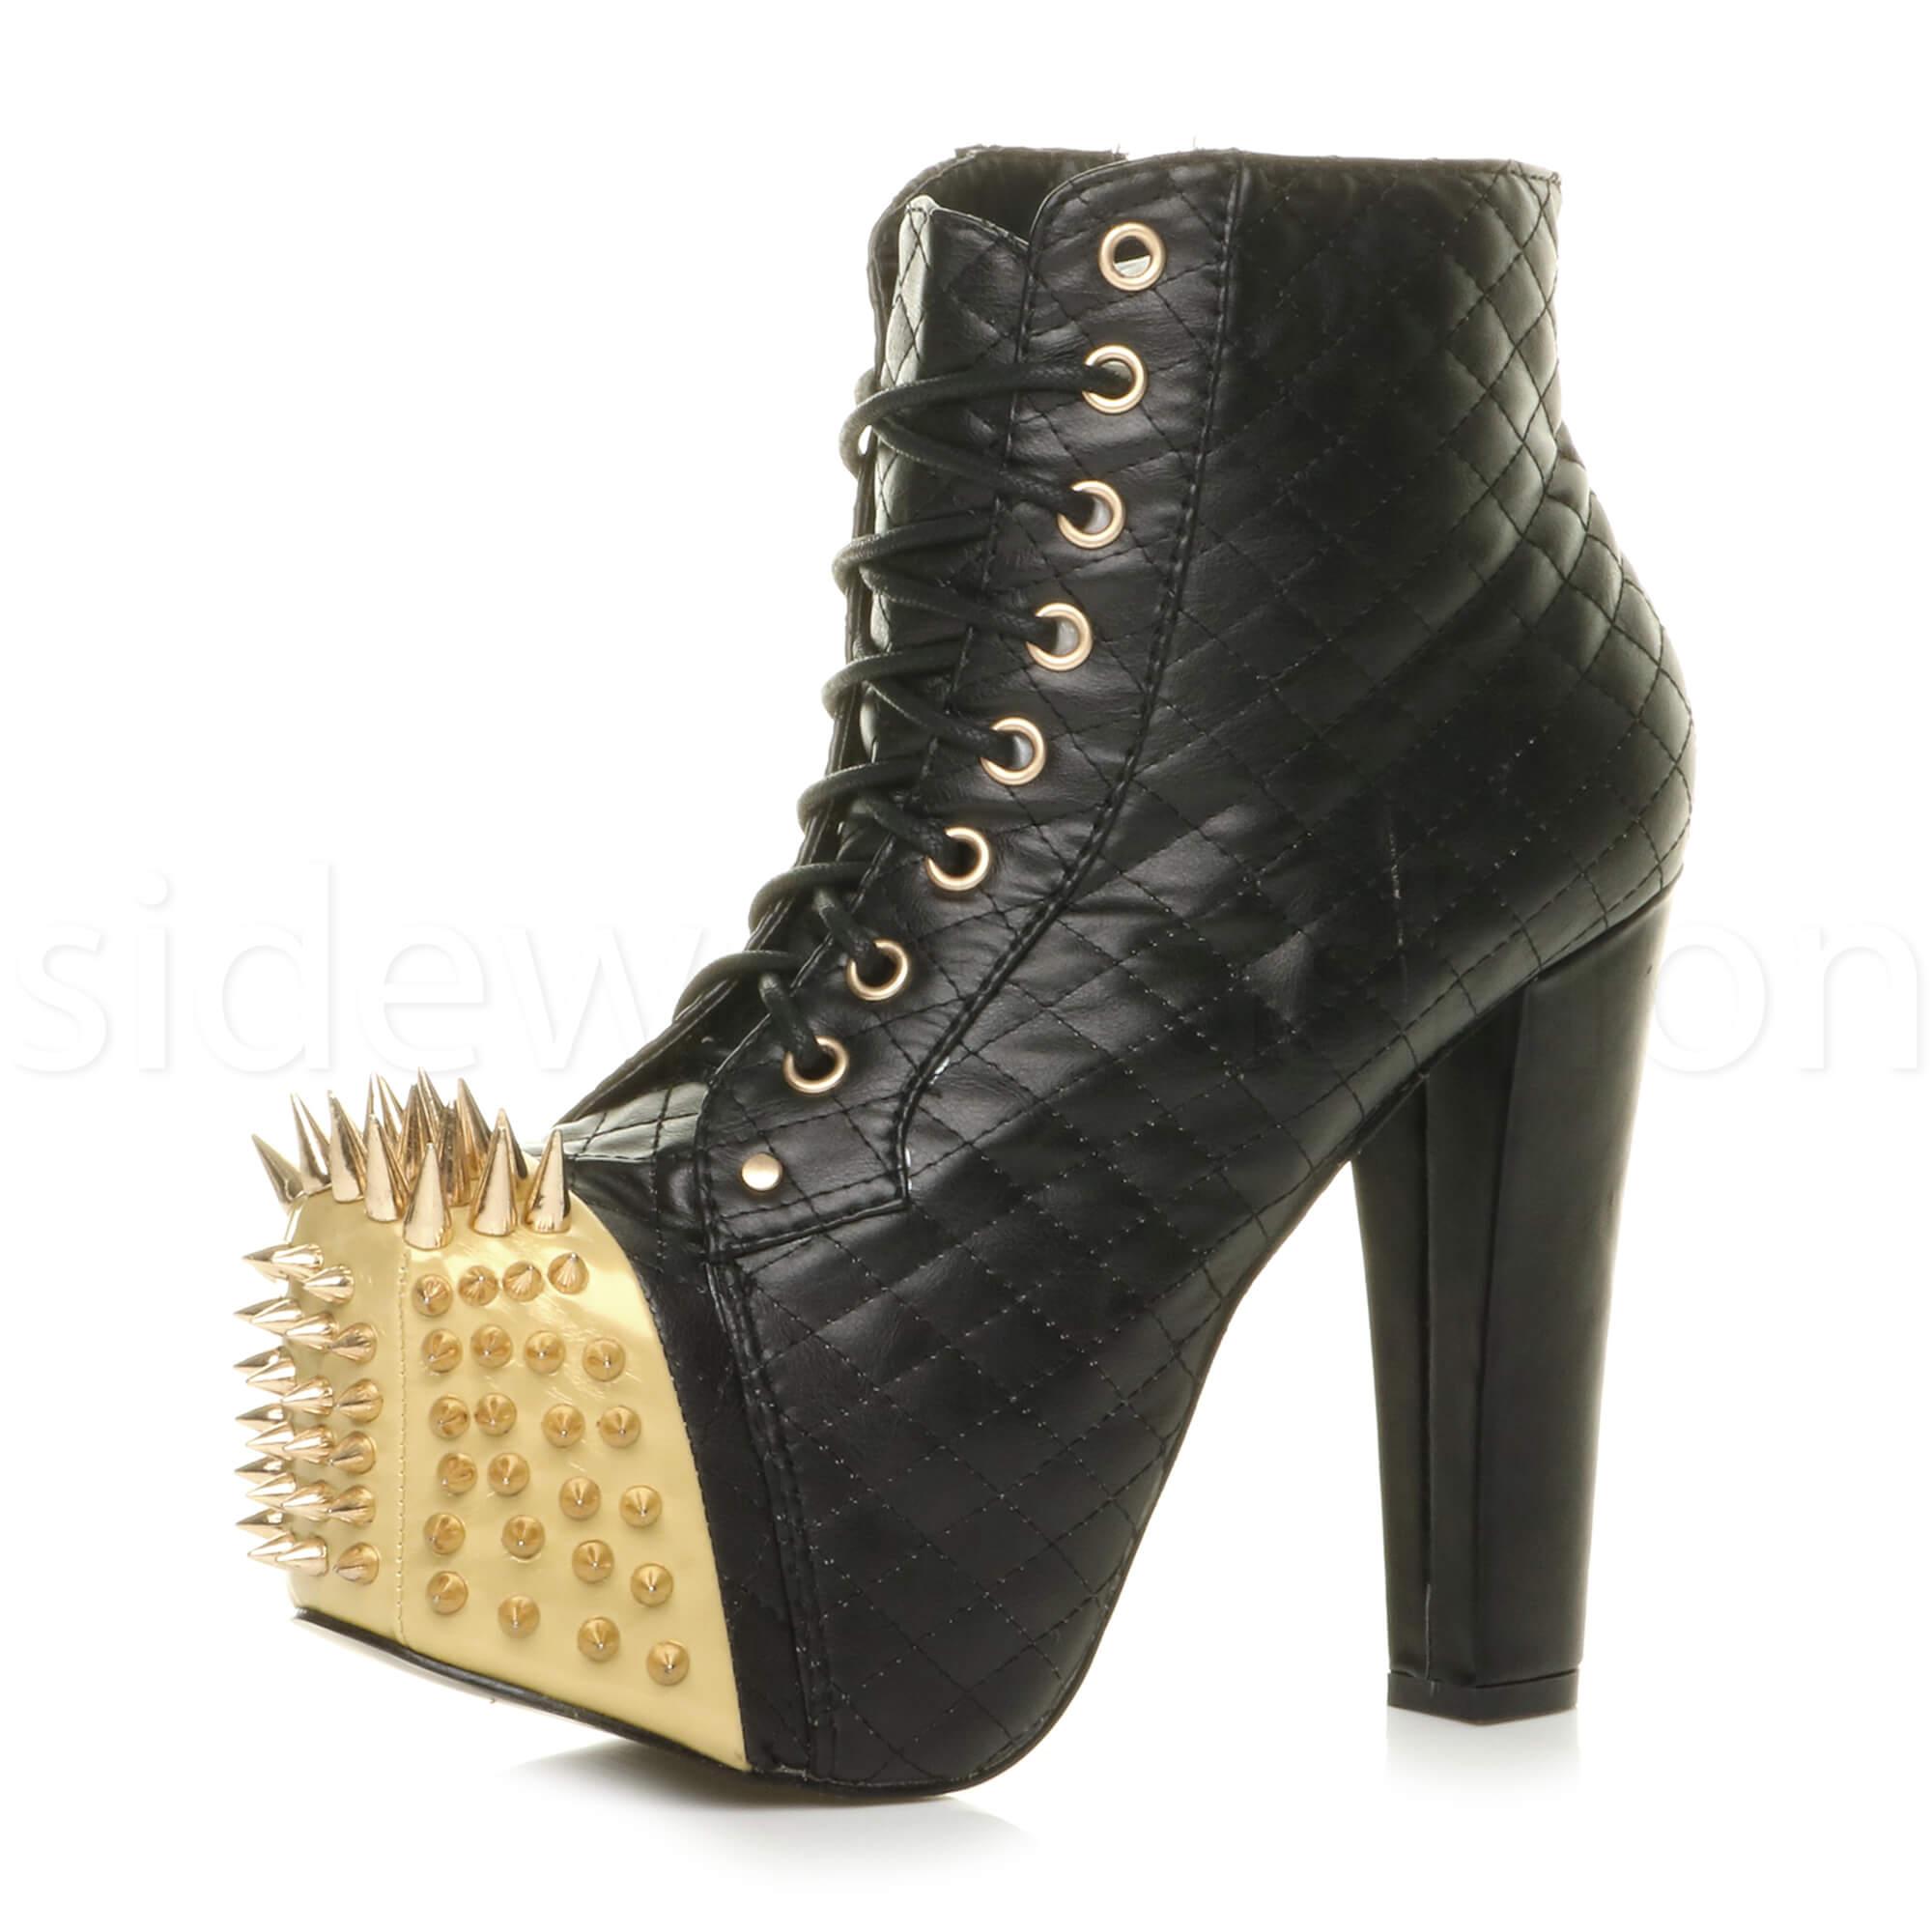 WOMENS-LADIES-HIGH-BLOCK-HEEL-ZIP-PLATFORM-LACE-UP-ANKLE-BOOTS-BOOTIES-SIZE